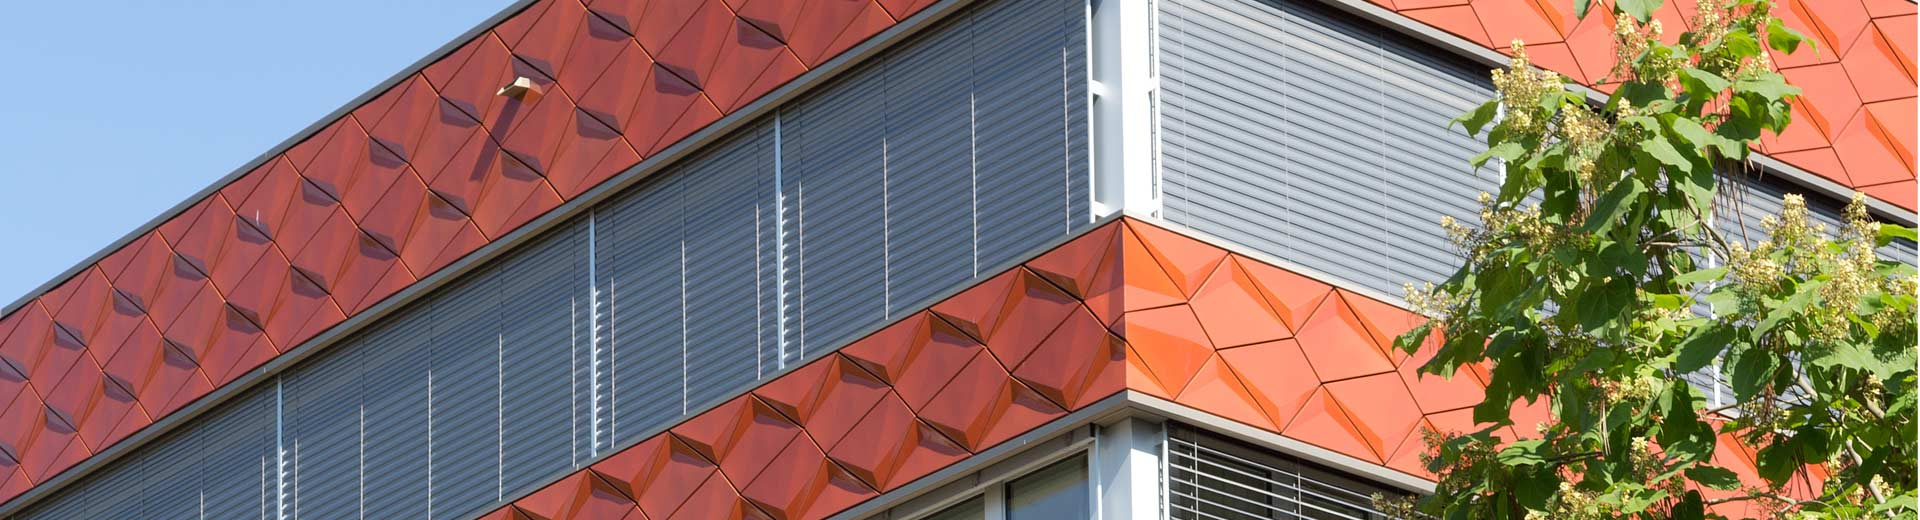 Dreidimensionale Keramikformen für Fassaden